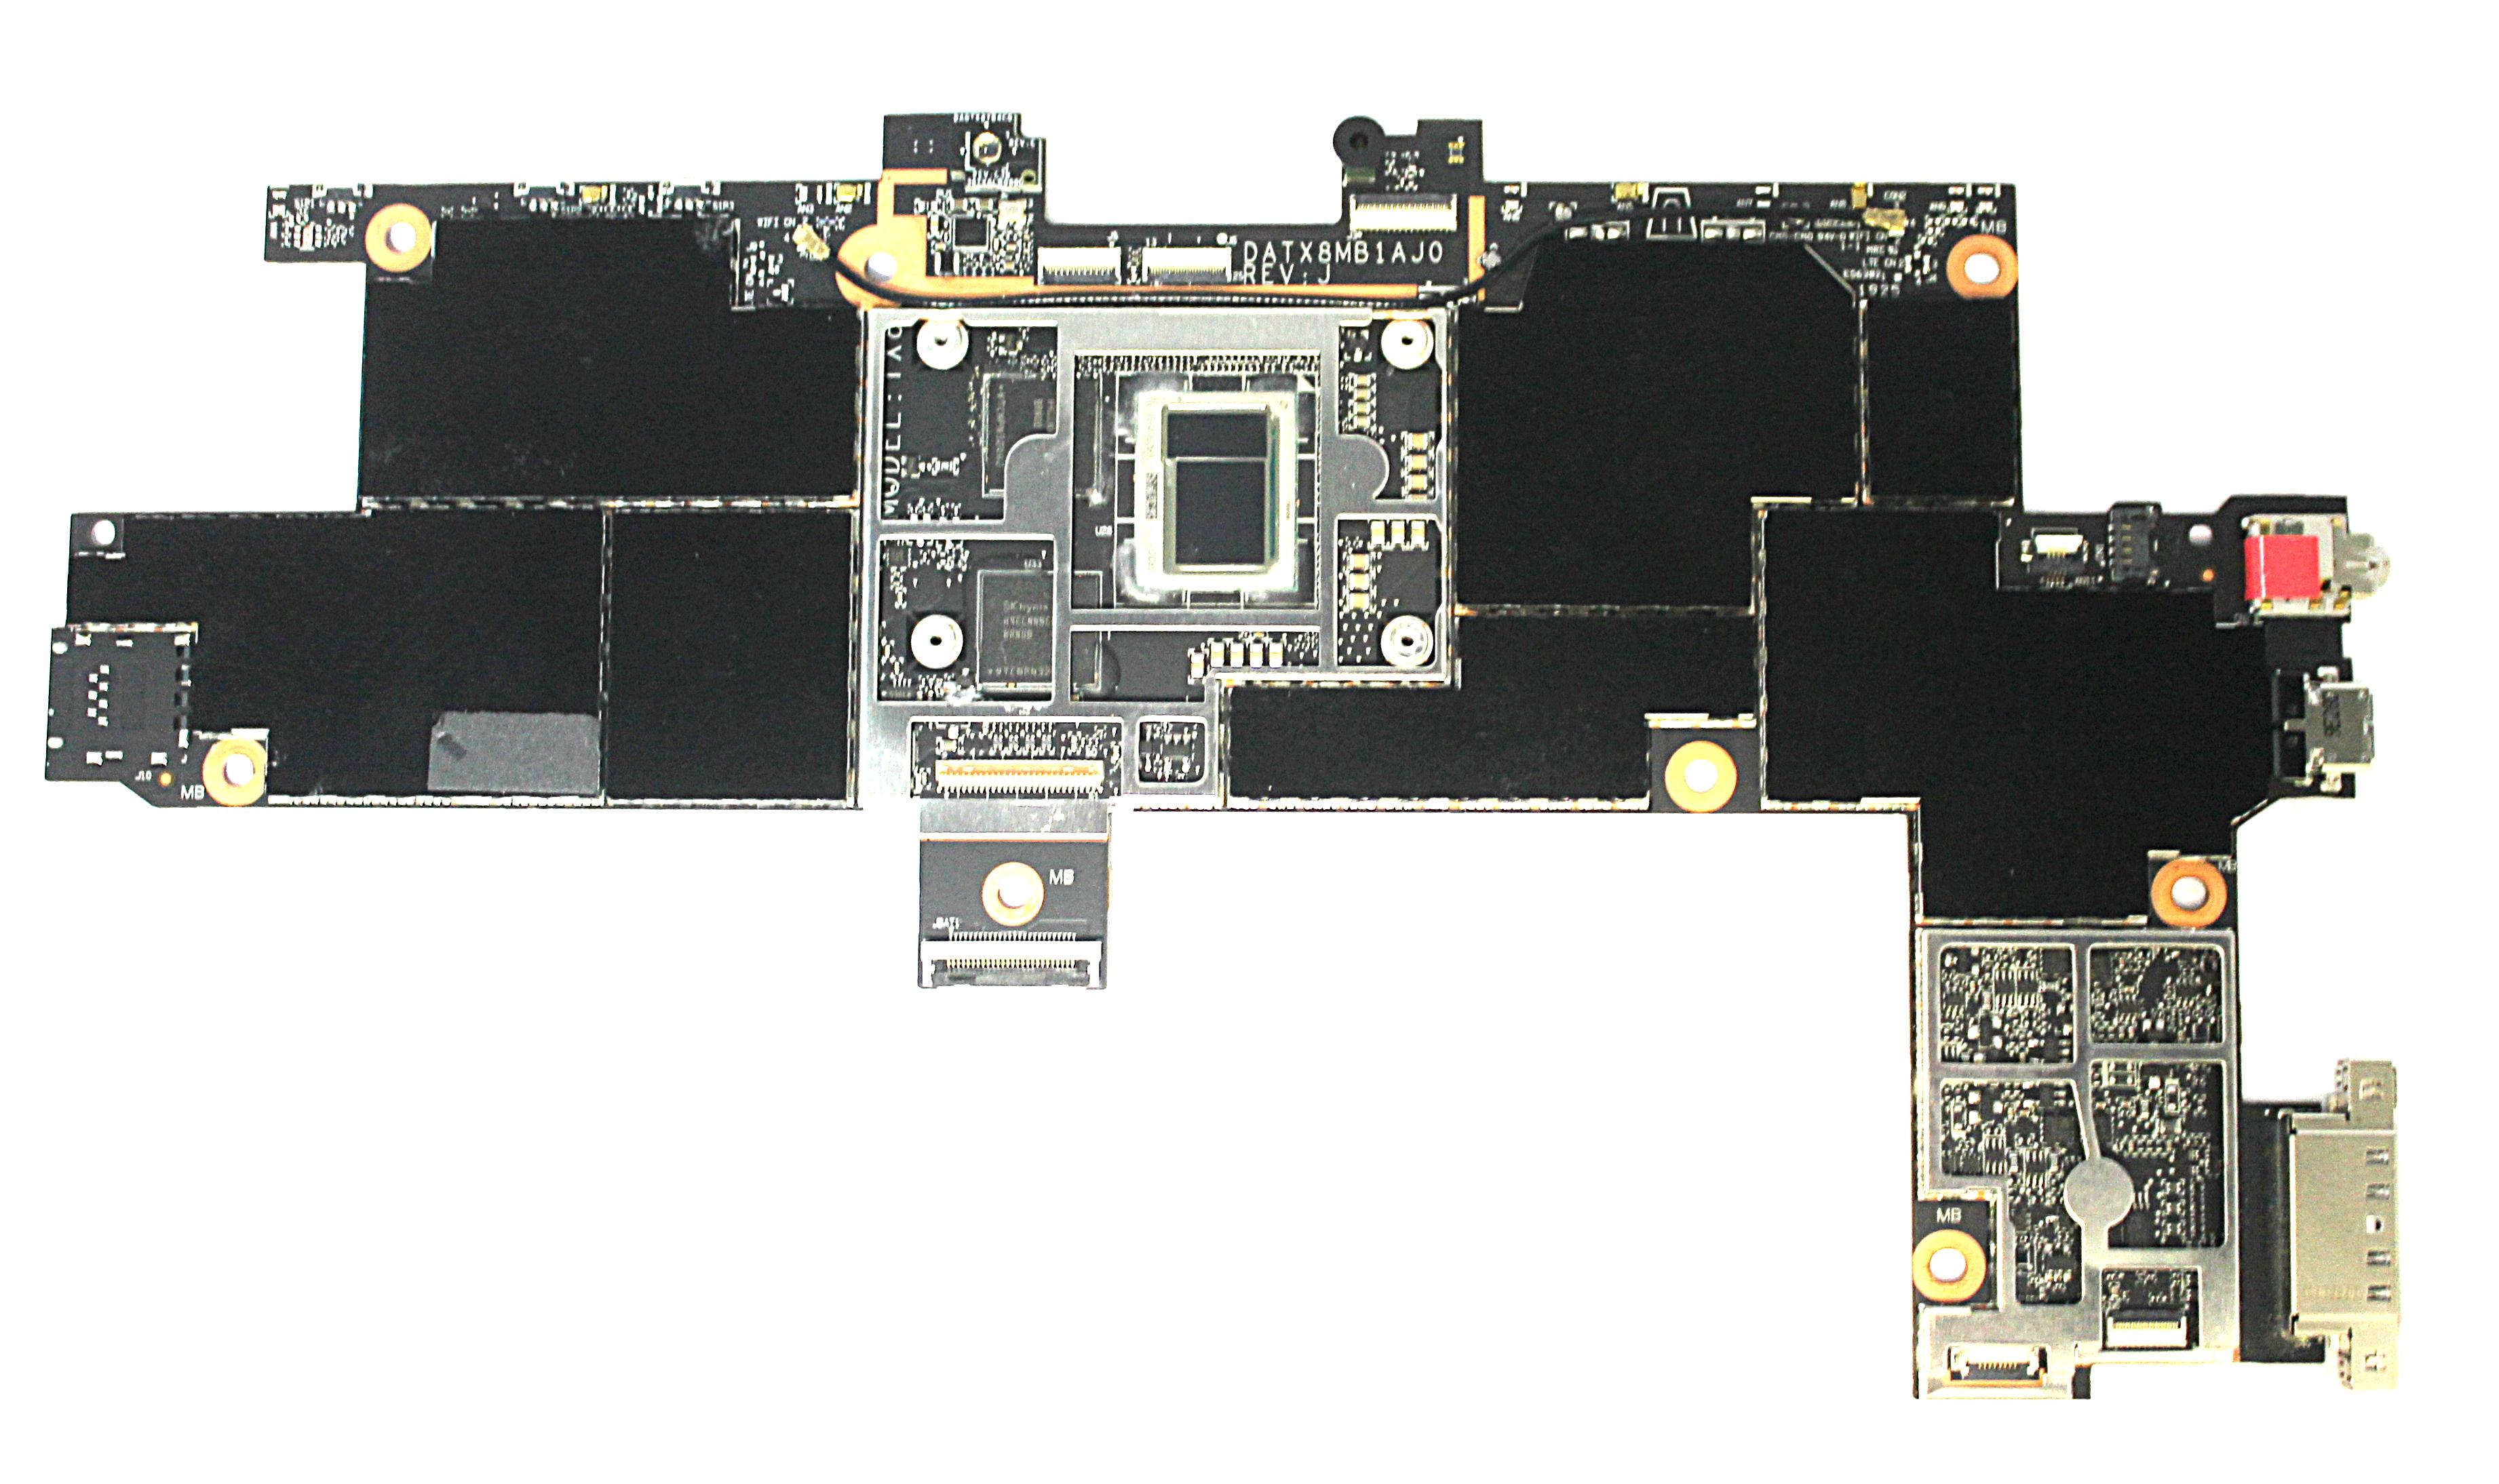 Surface Go - 1824/CPU 4415Y/8GB Ram/128GB eMMC/Main Board/DATX8MB1AJ0-REV:J